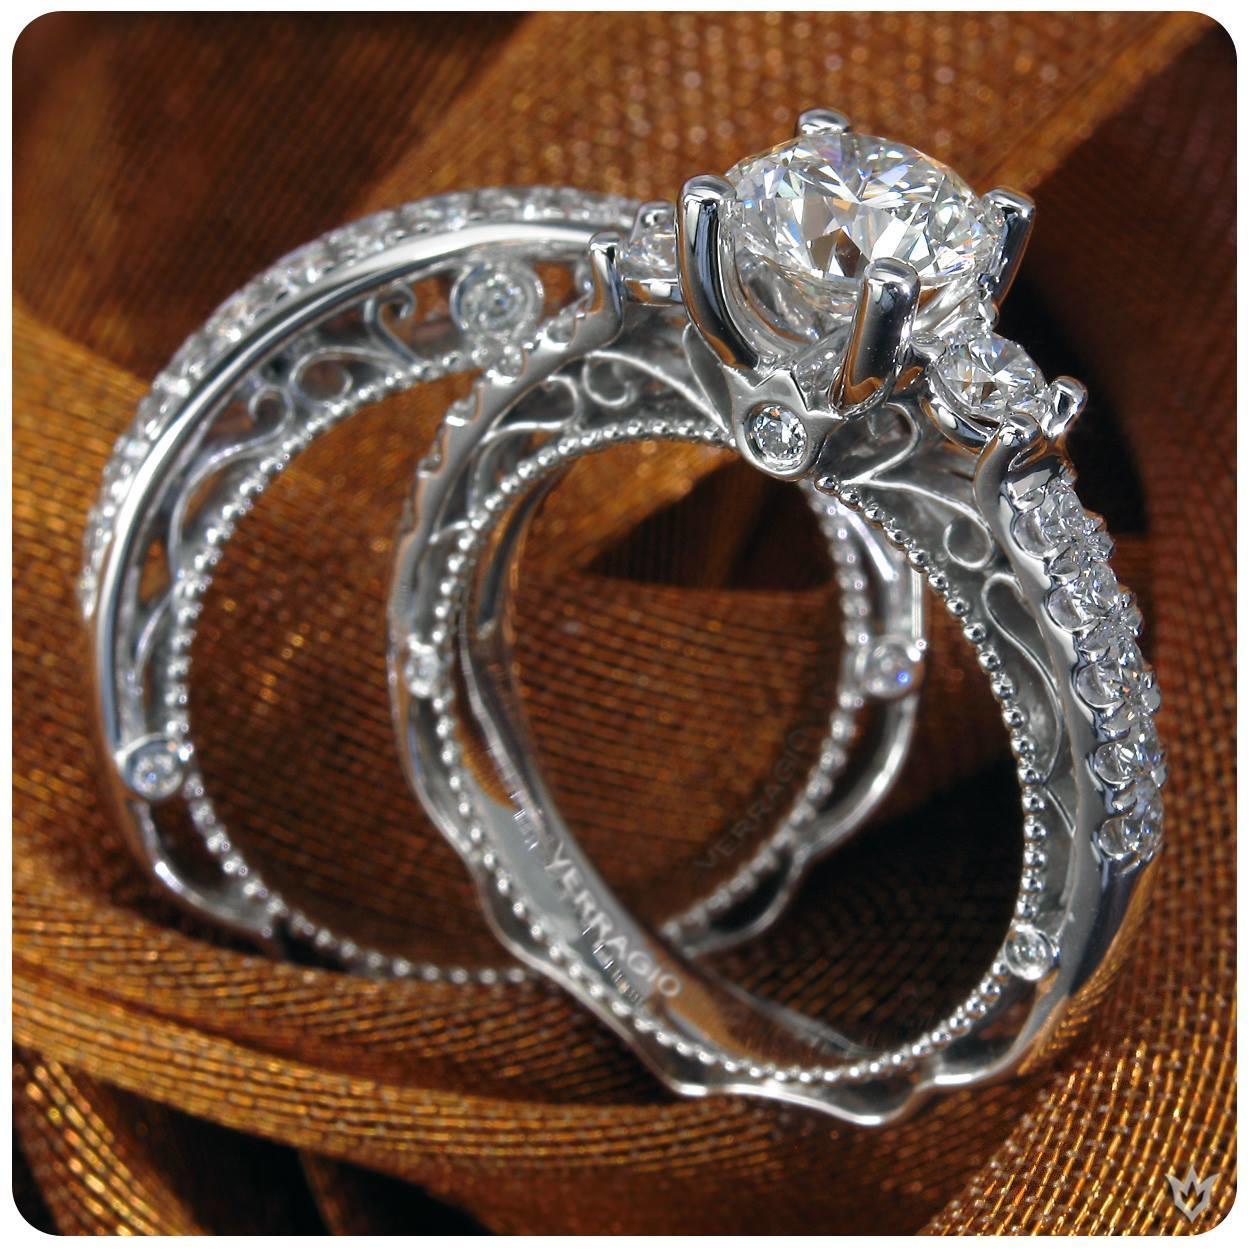 Emerald Lady Jewelry image 43